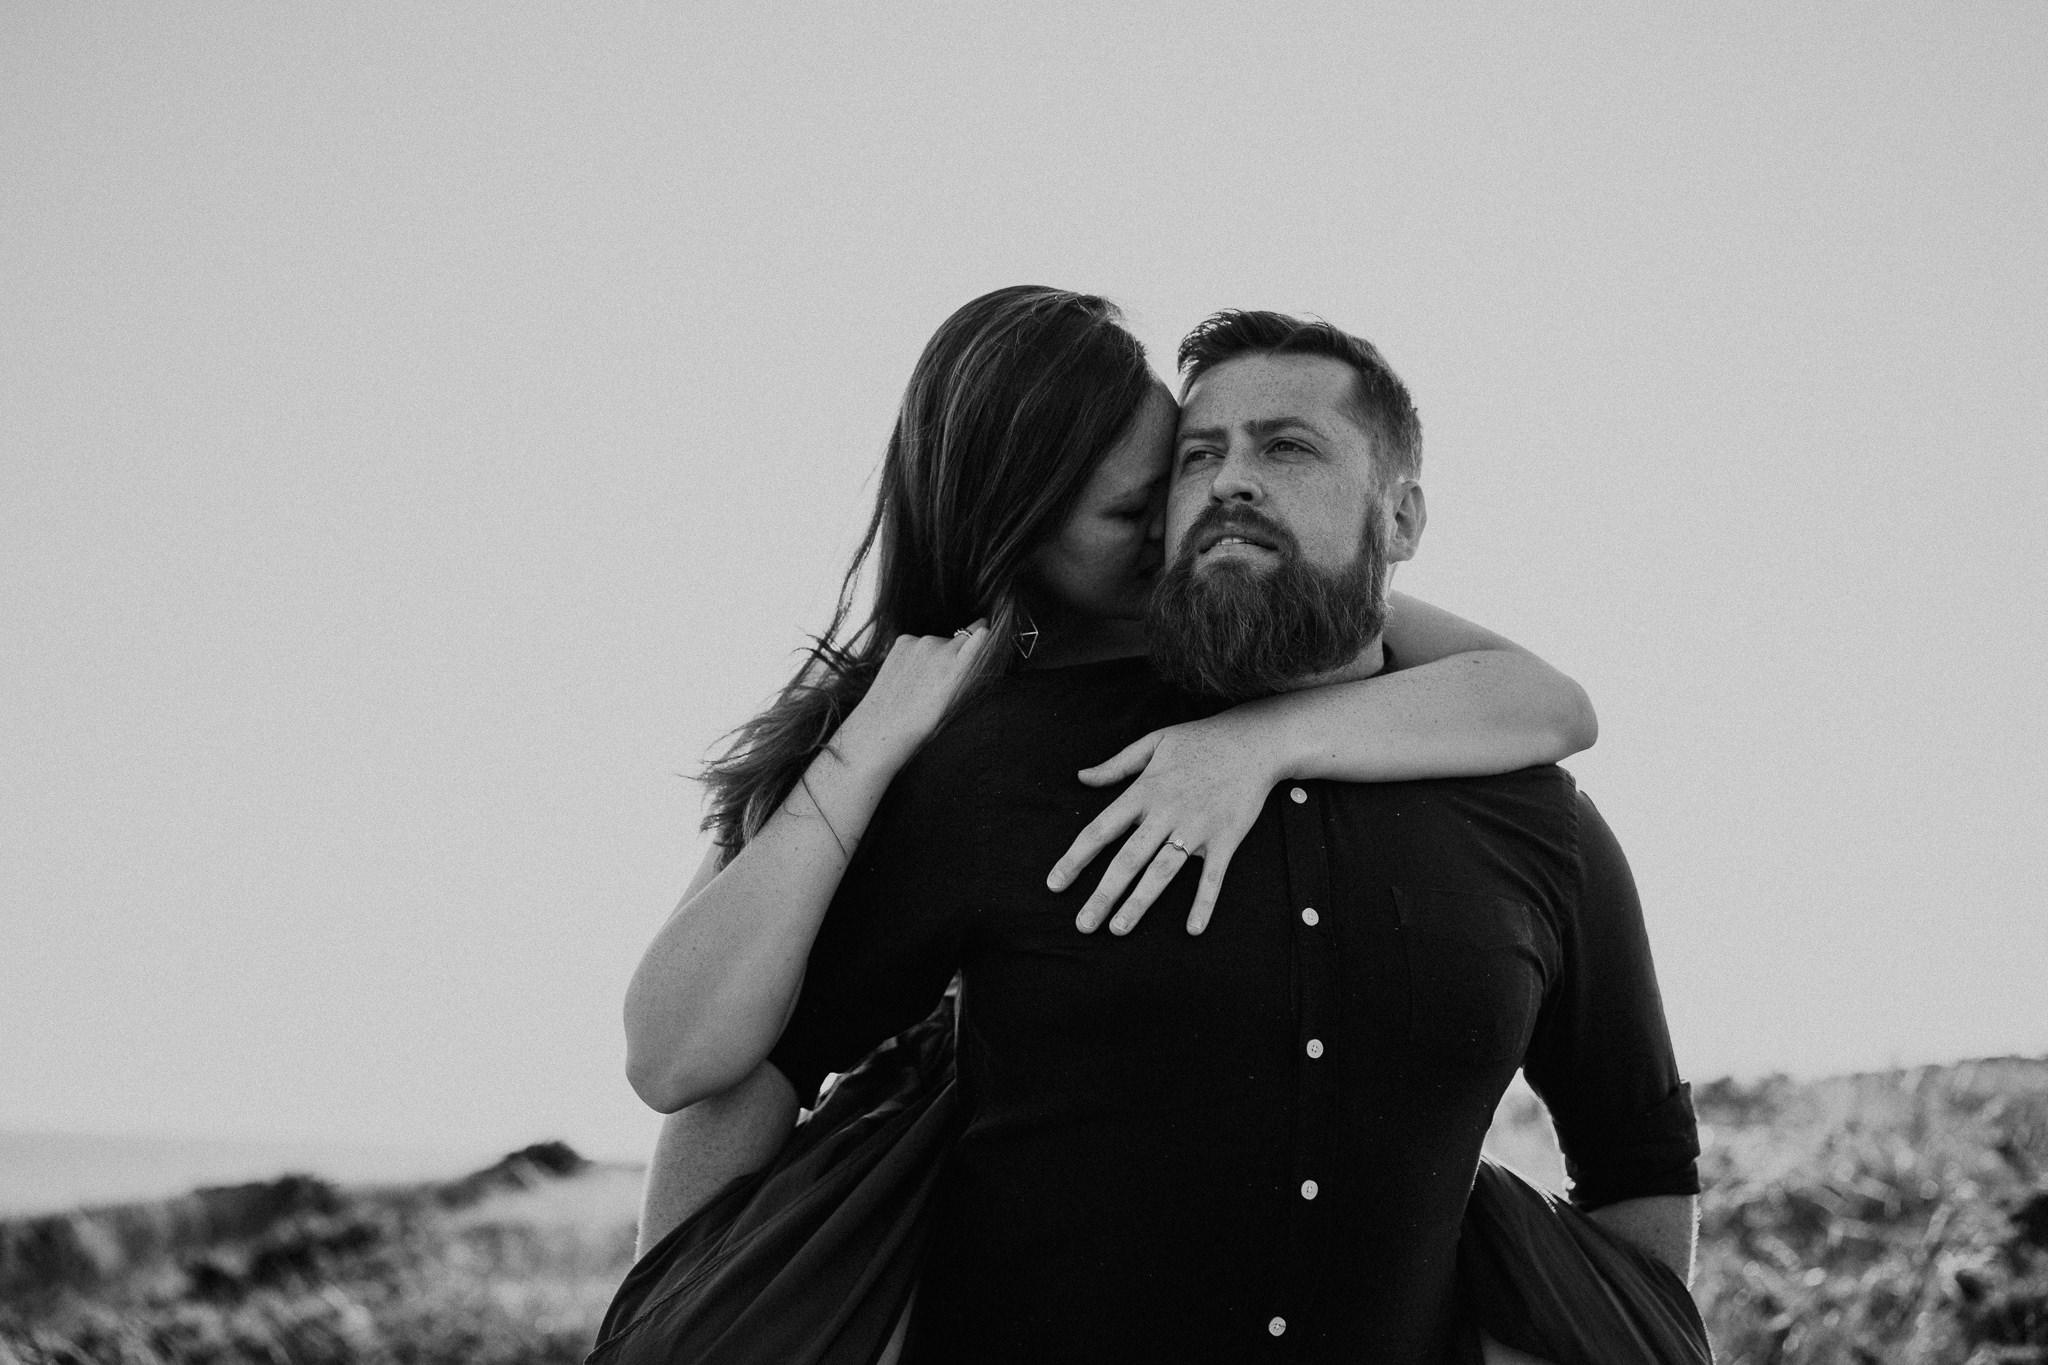 photographe-mariage-destination-wedding-photographer-dorotheebuteau-1